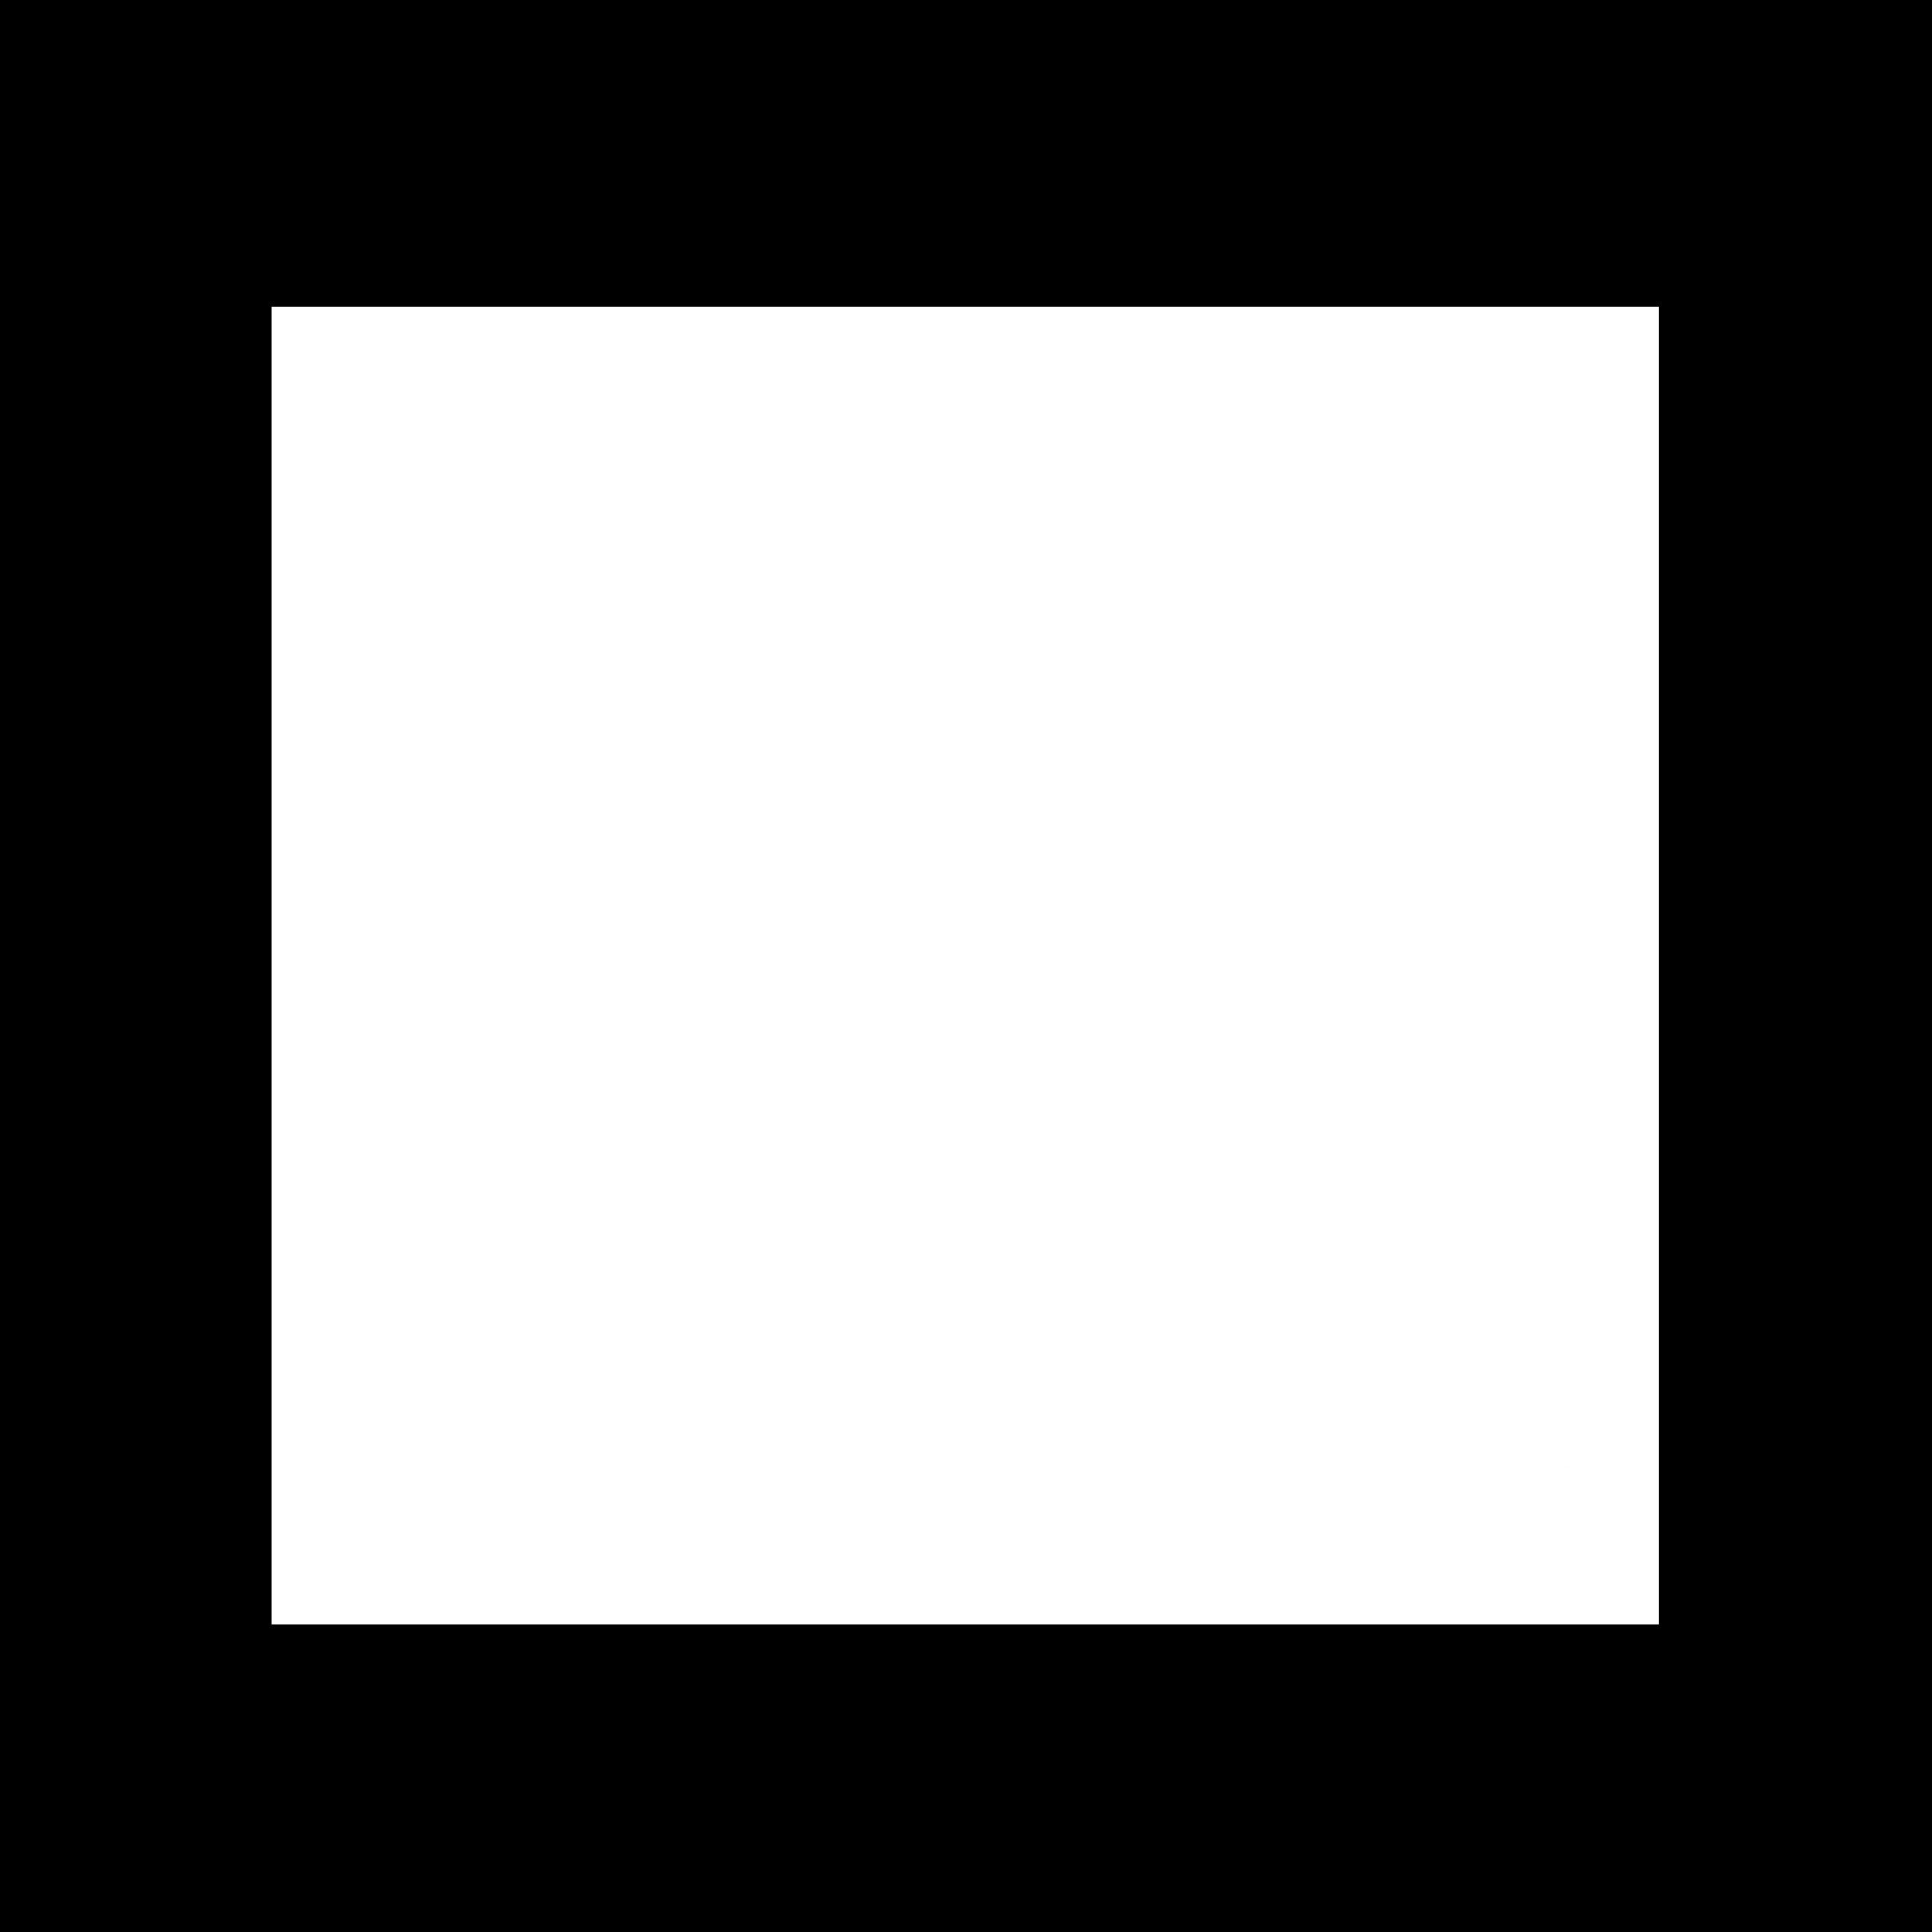 BX1 Transfer